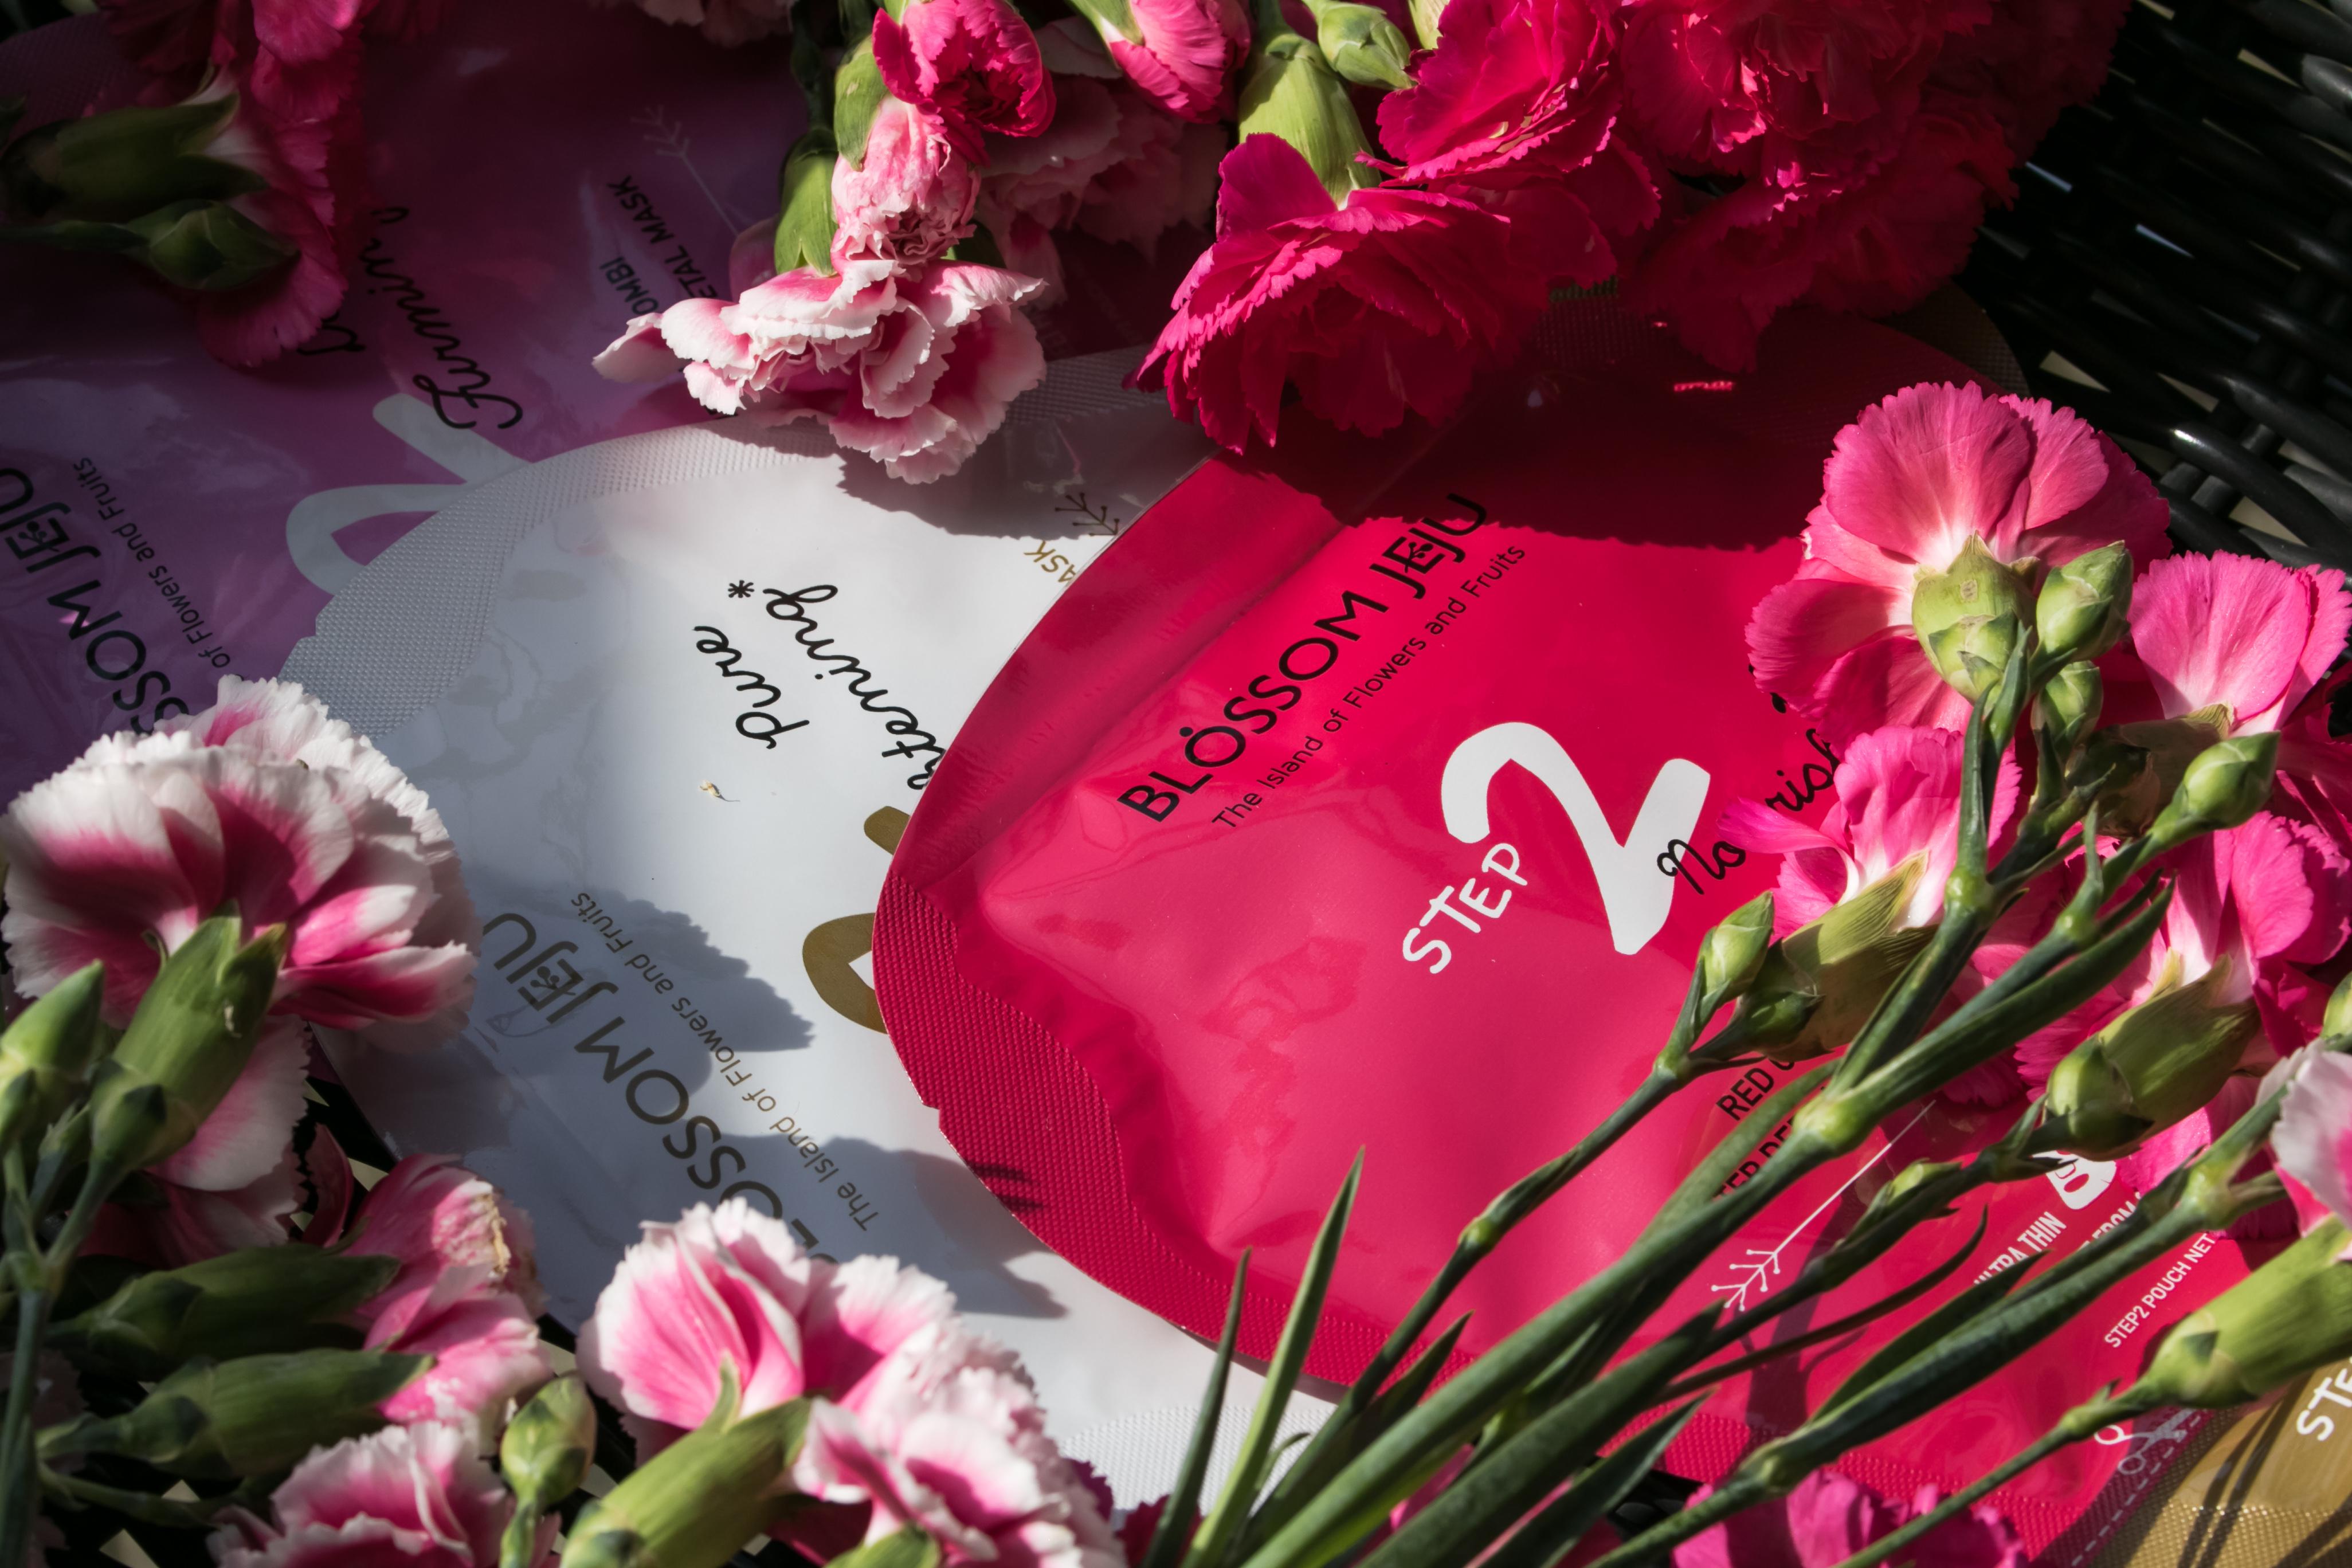 Korean skincare Blossom Jeju sheet masks